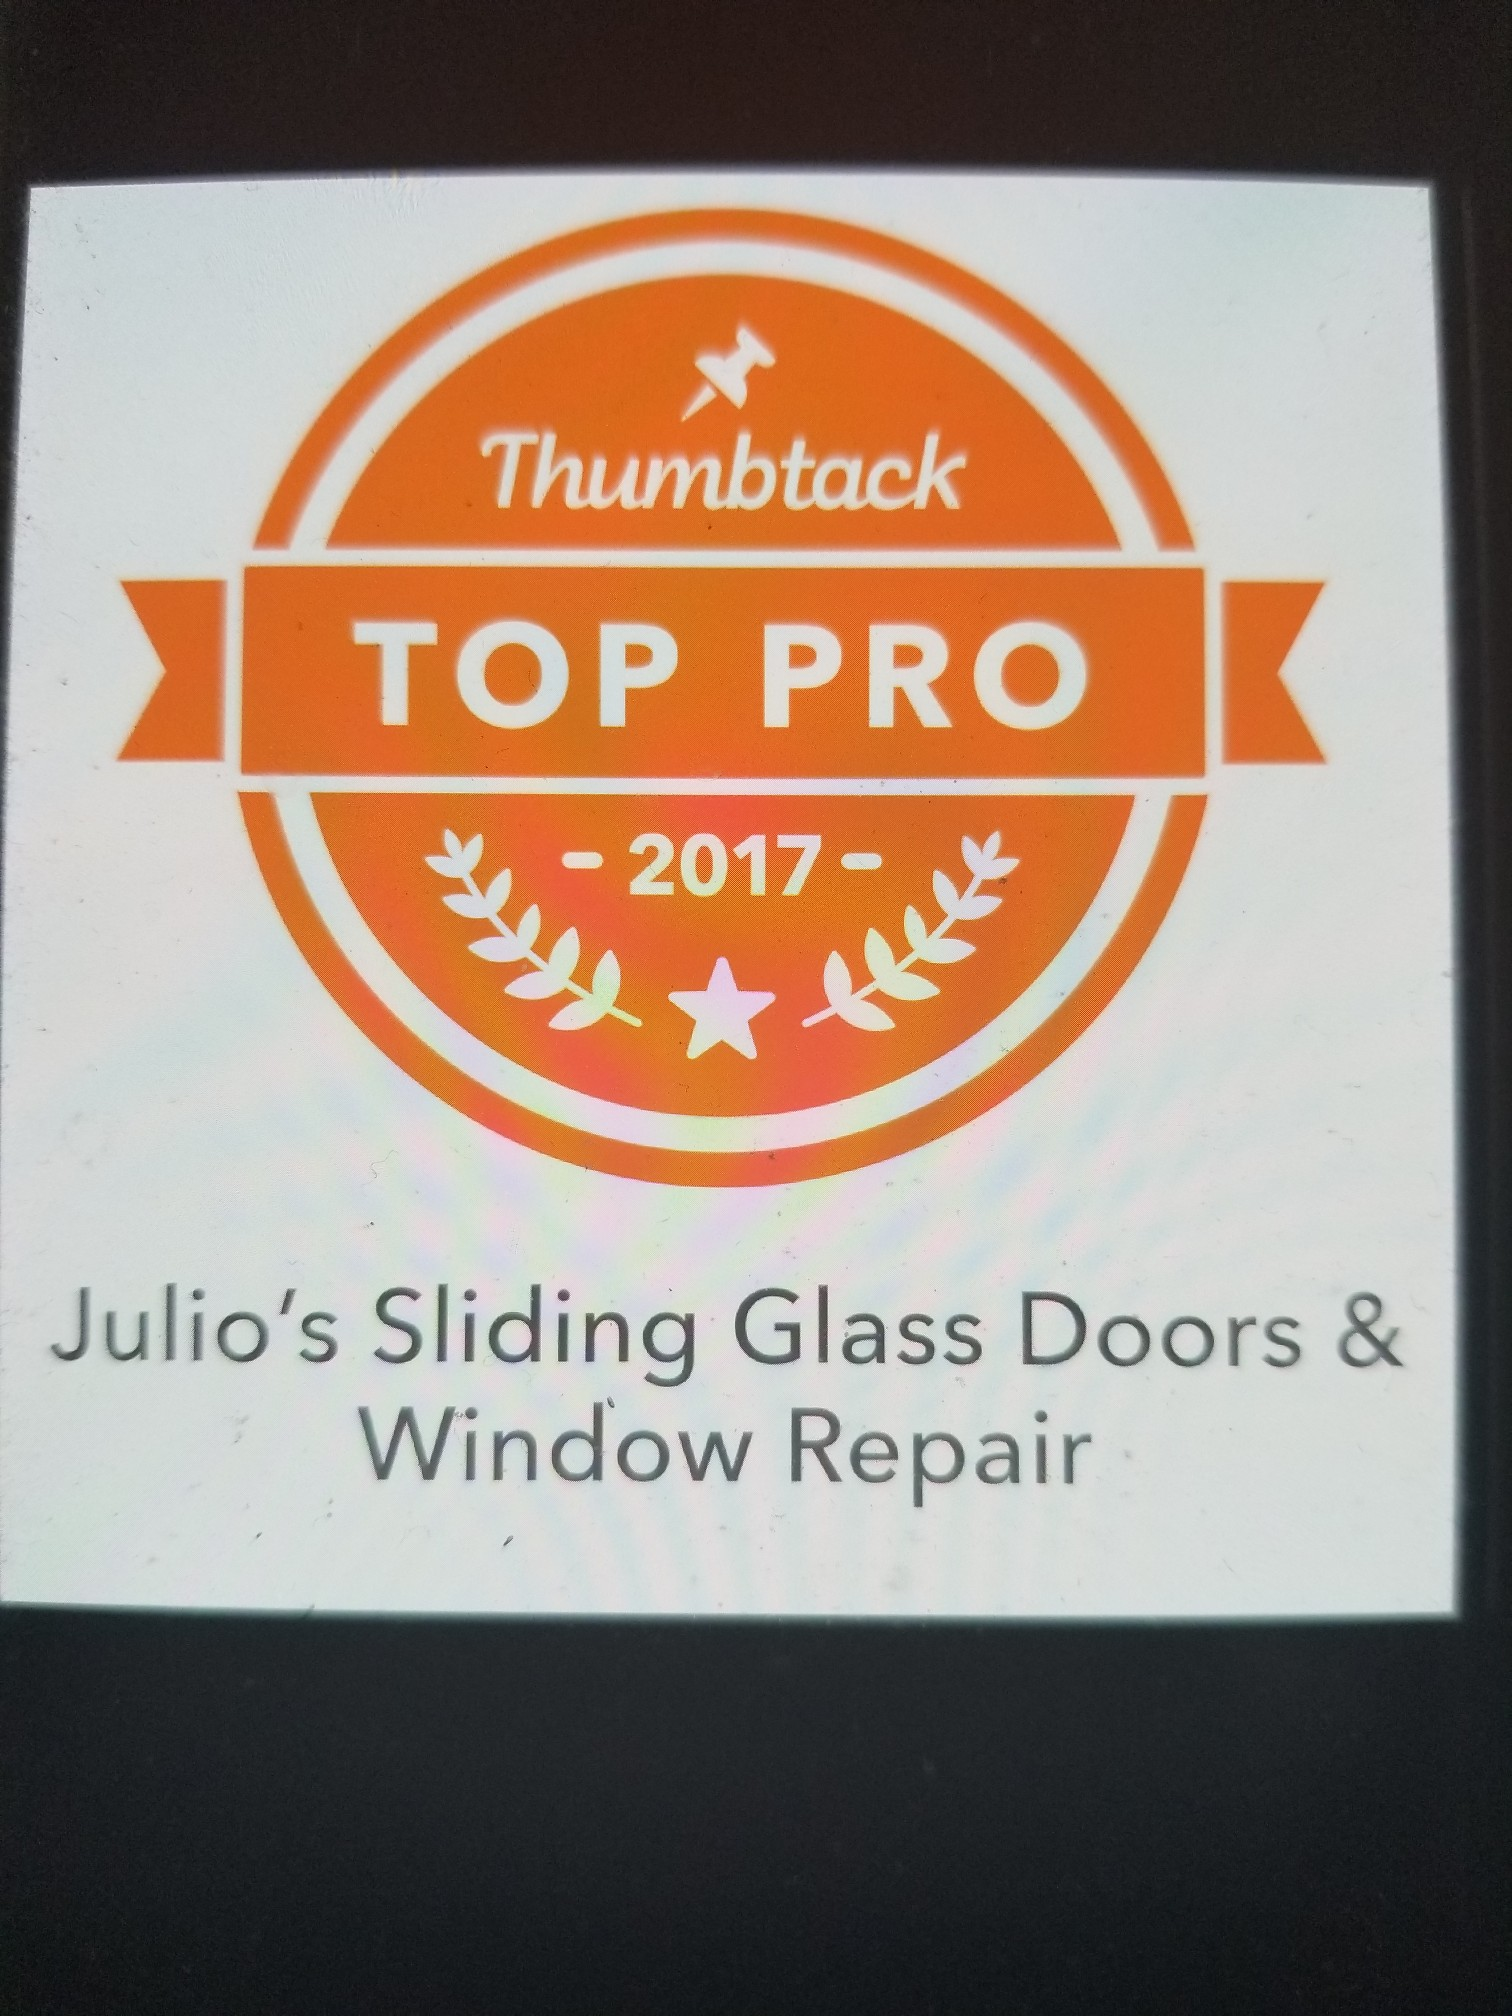 Julios Sliding Glass Doors Window Repair 12358 Sw 192nd Ave